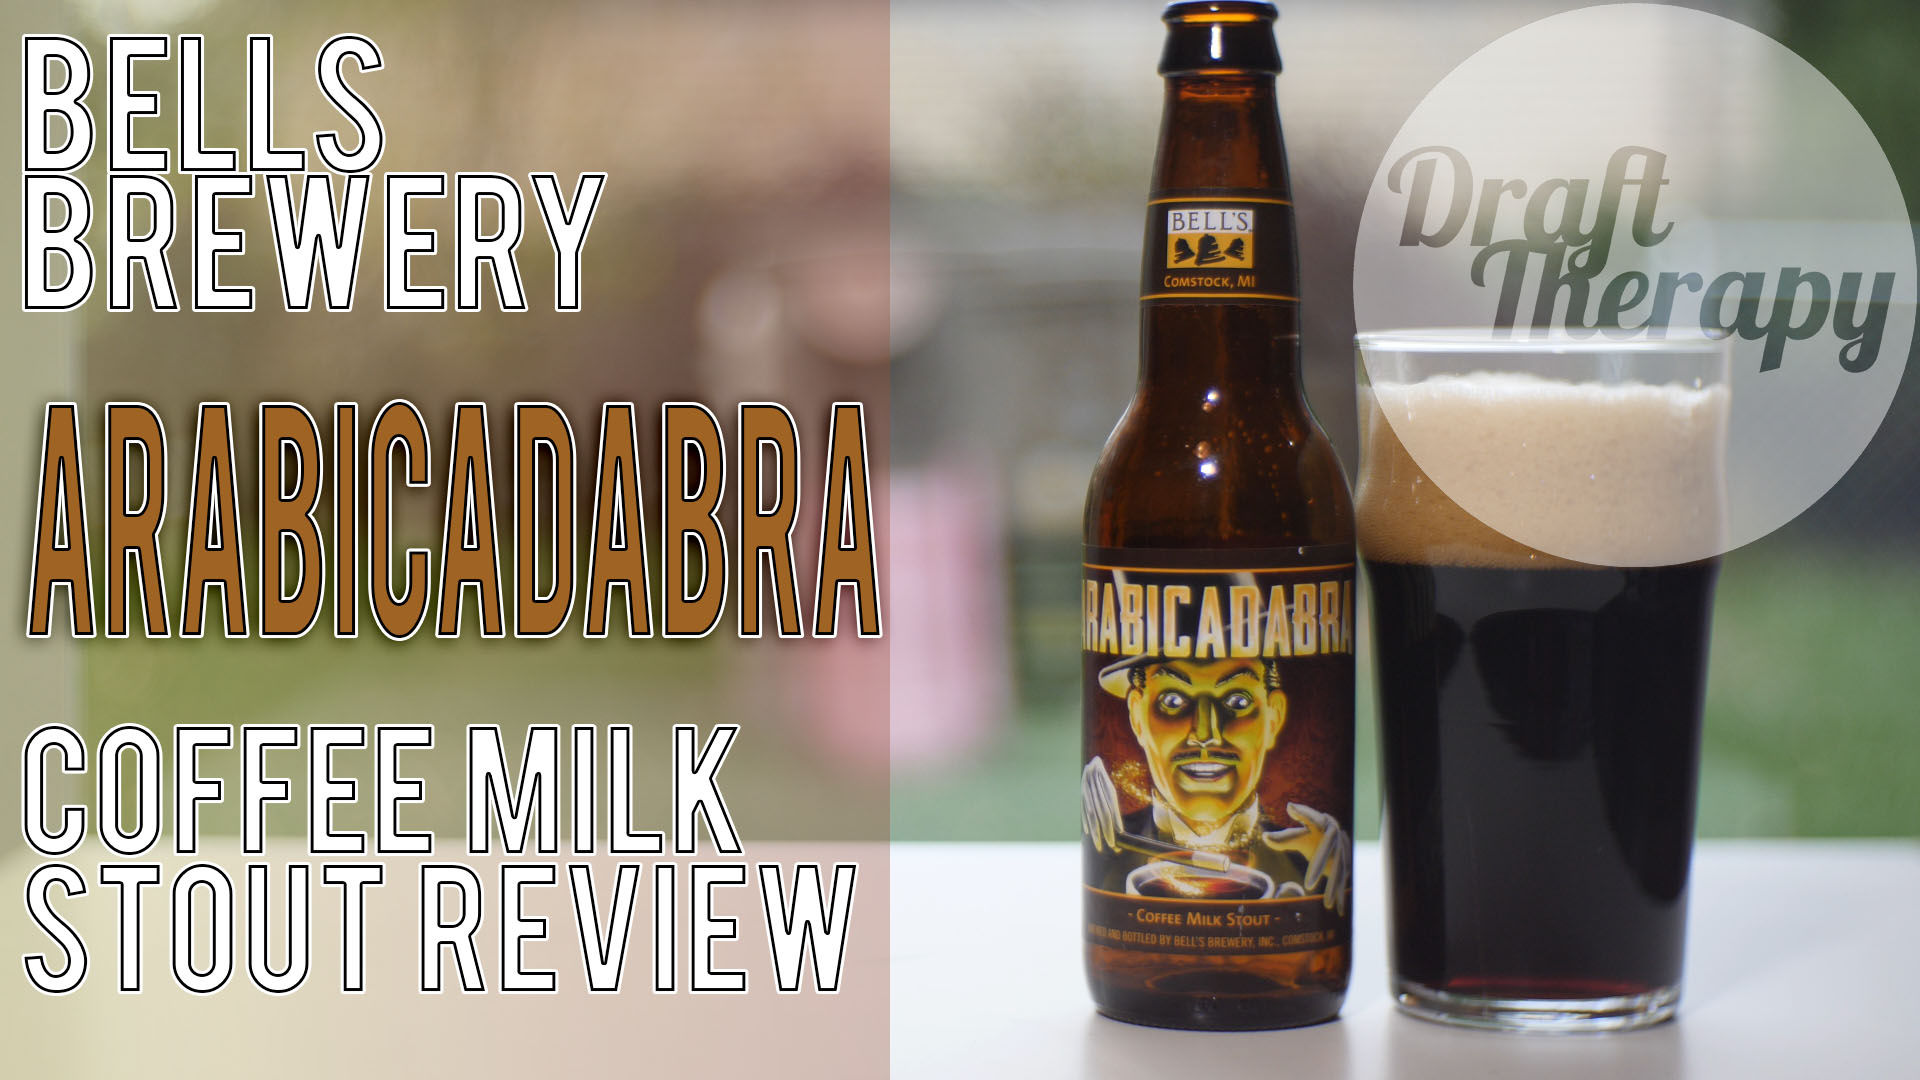 Bell's Brewing – Arabicadabra Coffee Milk Stout Review